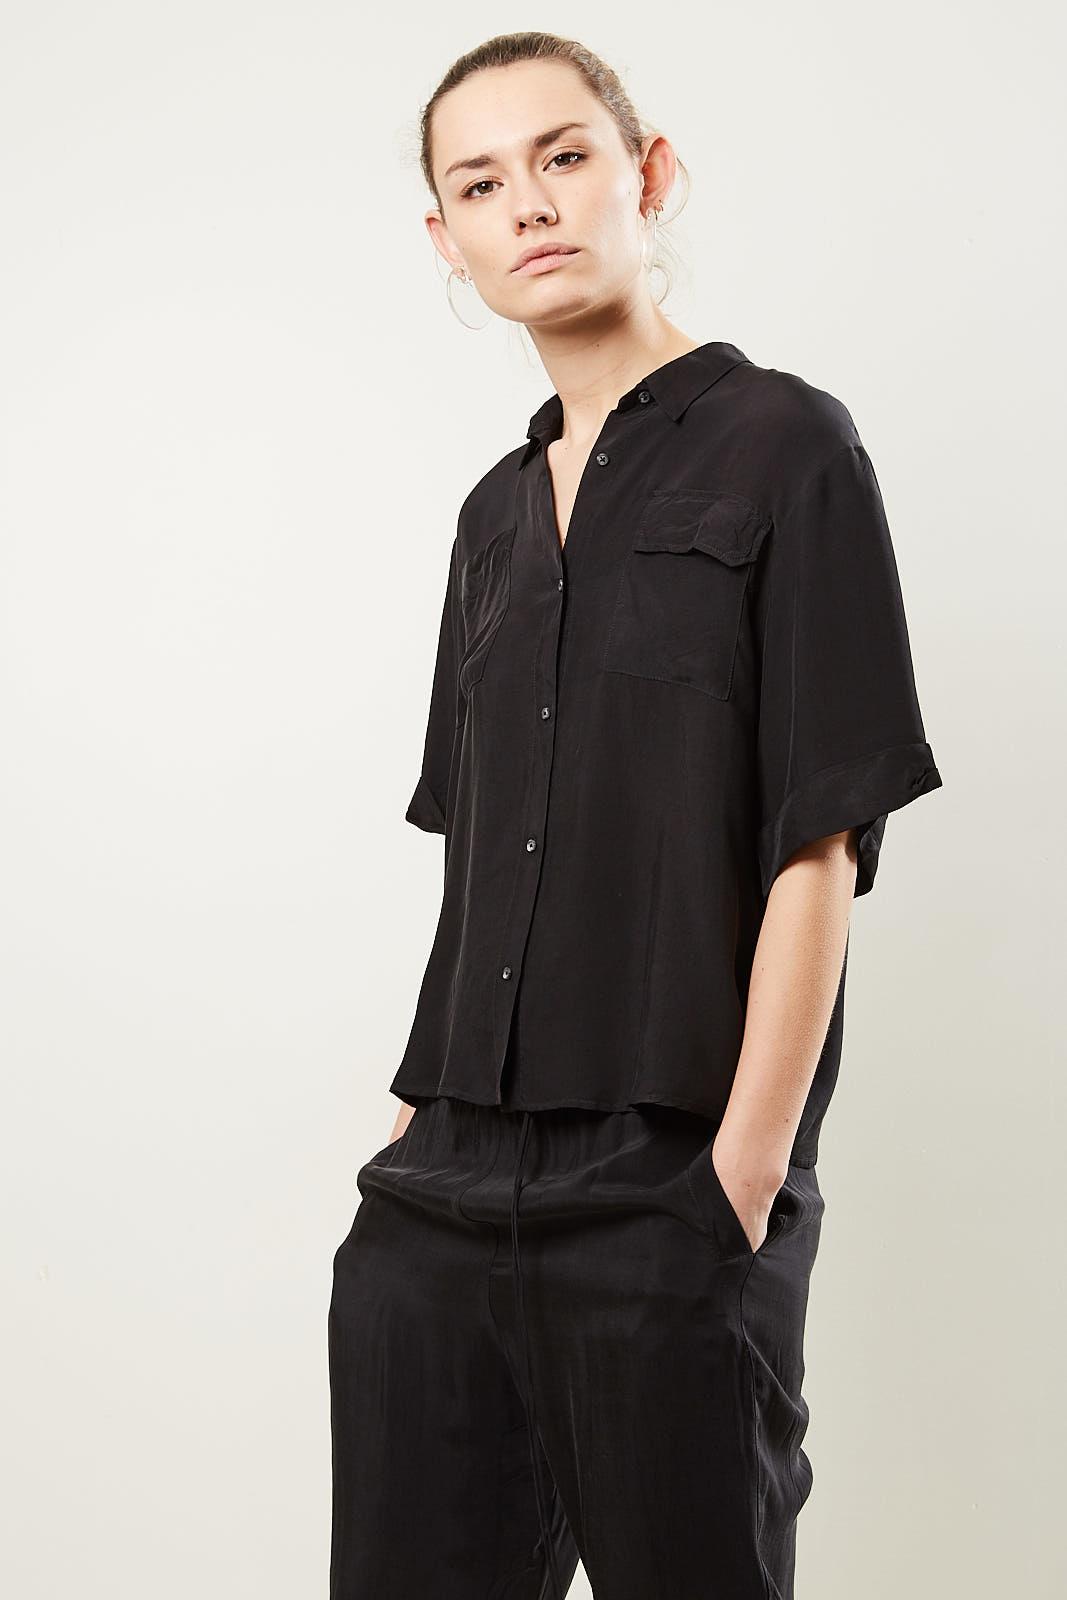 Humanoid - Daelo diamond blouse blackish